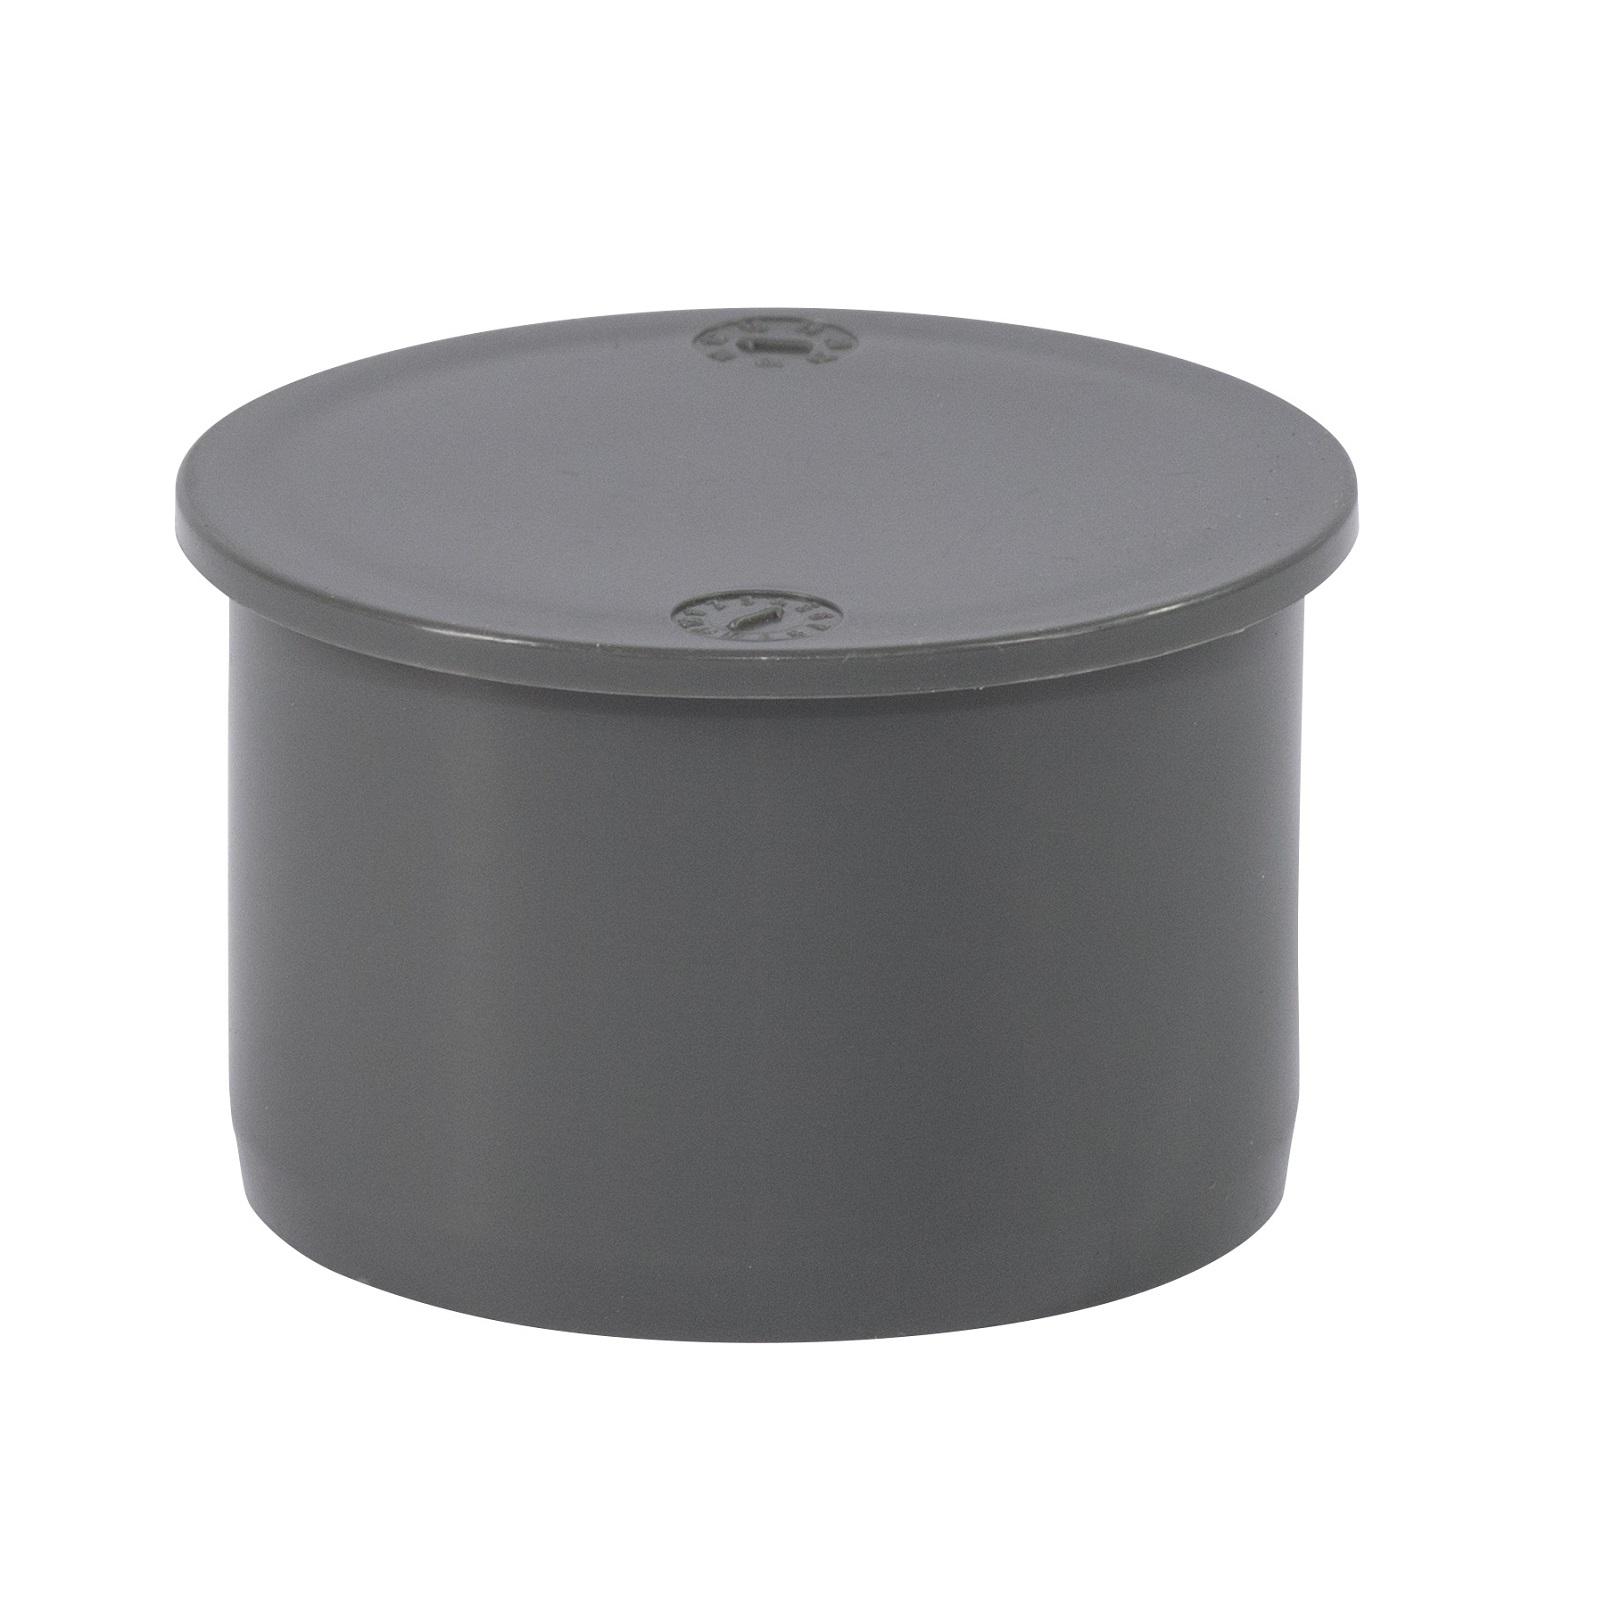 htsafe muffenstopfen dn50 kunststoff rohr stopfen deckel grau. Black Bedroom Furniture Sets. Home Design Ideas